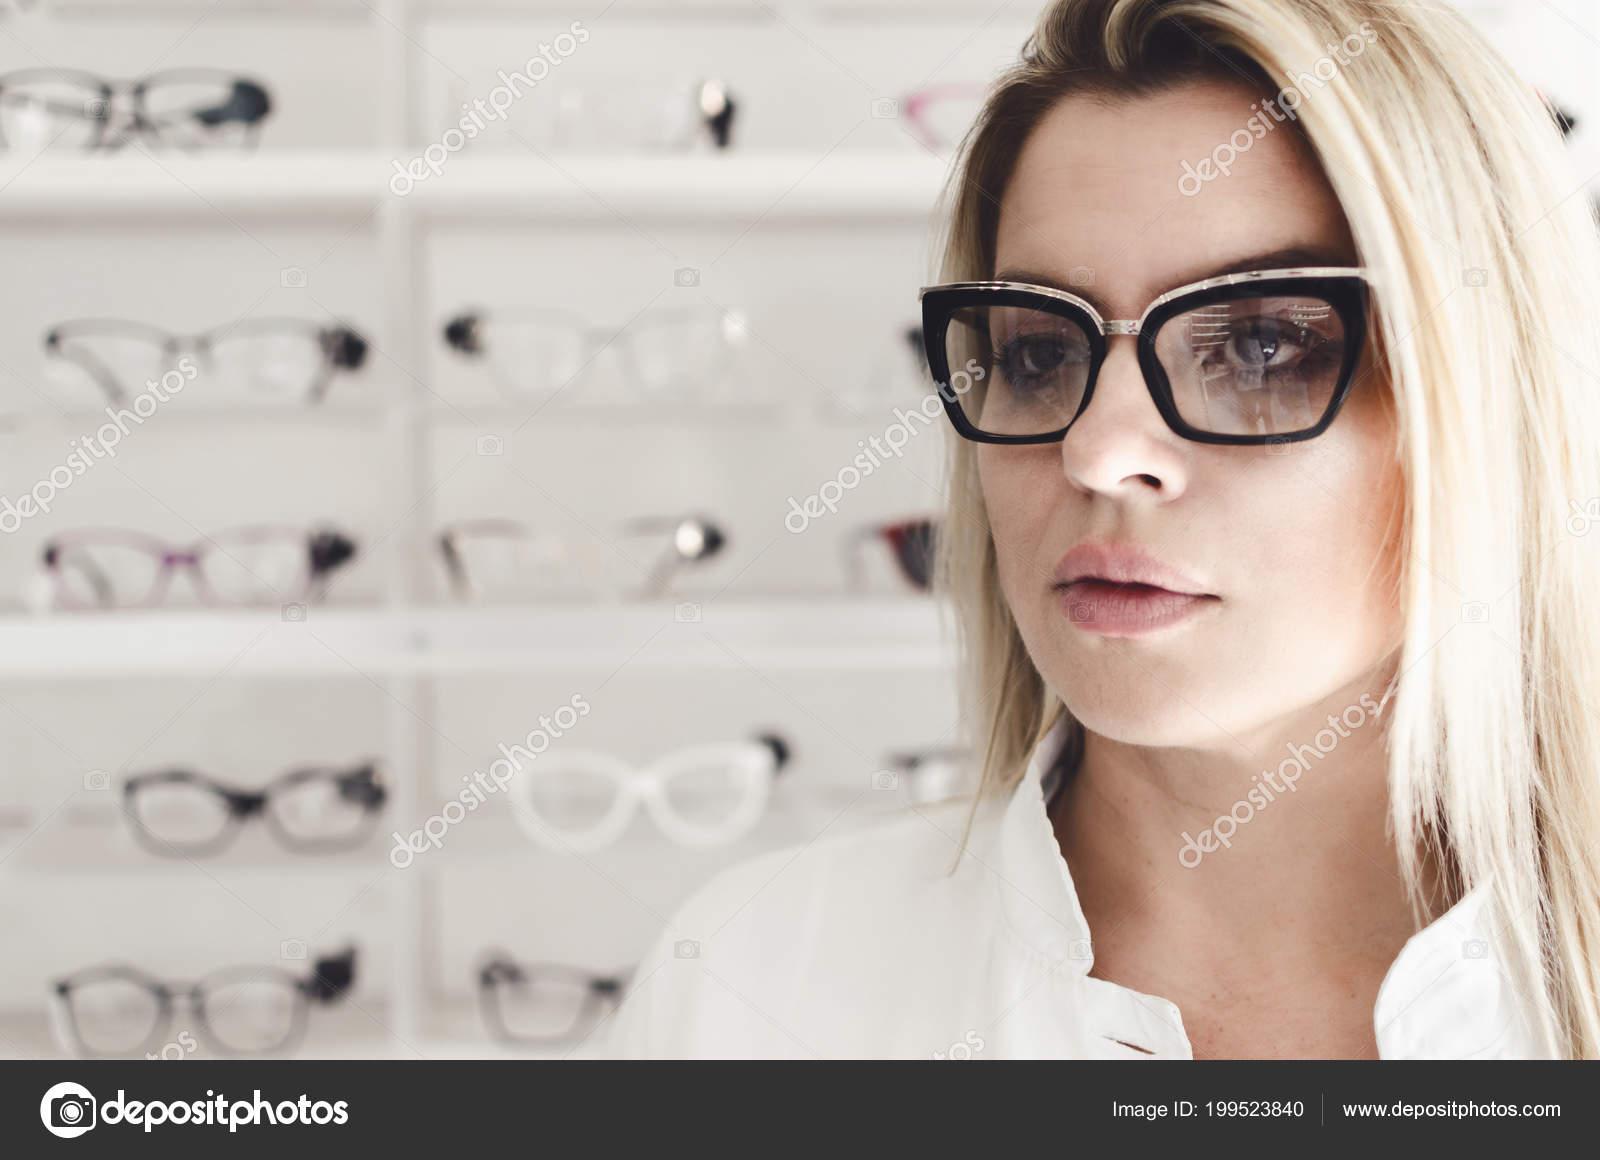 2cffde9848 Carismático Seguro Oculista Con Uniforme Blanco Mujer Lentes Moda Médico ...